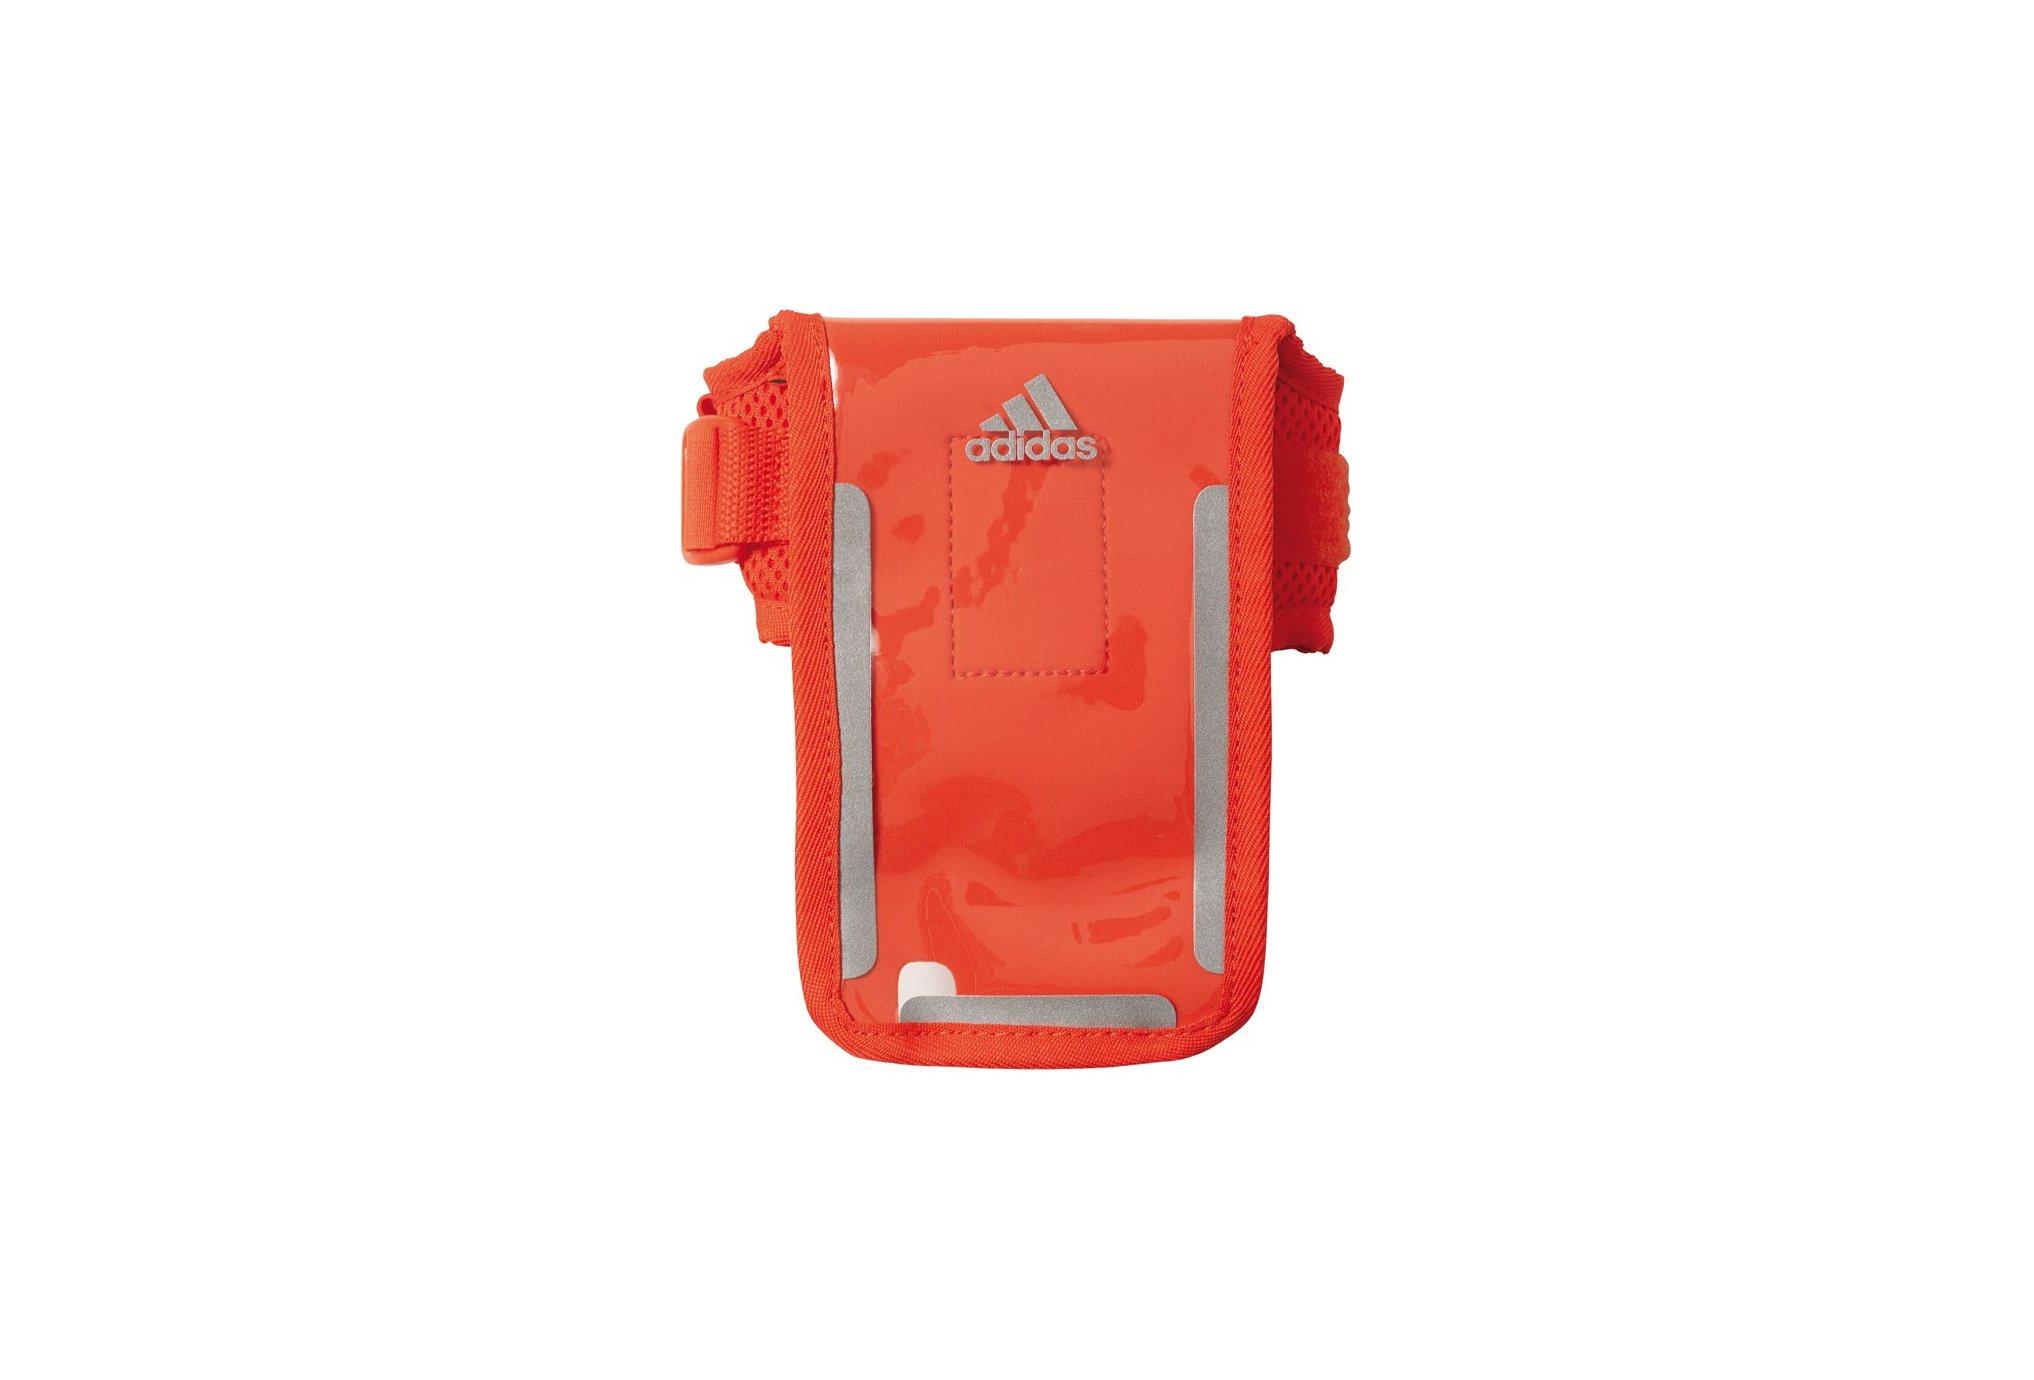 Adidas Multimédia accessoires téléphone